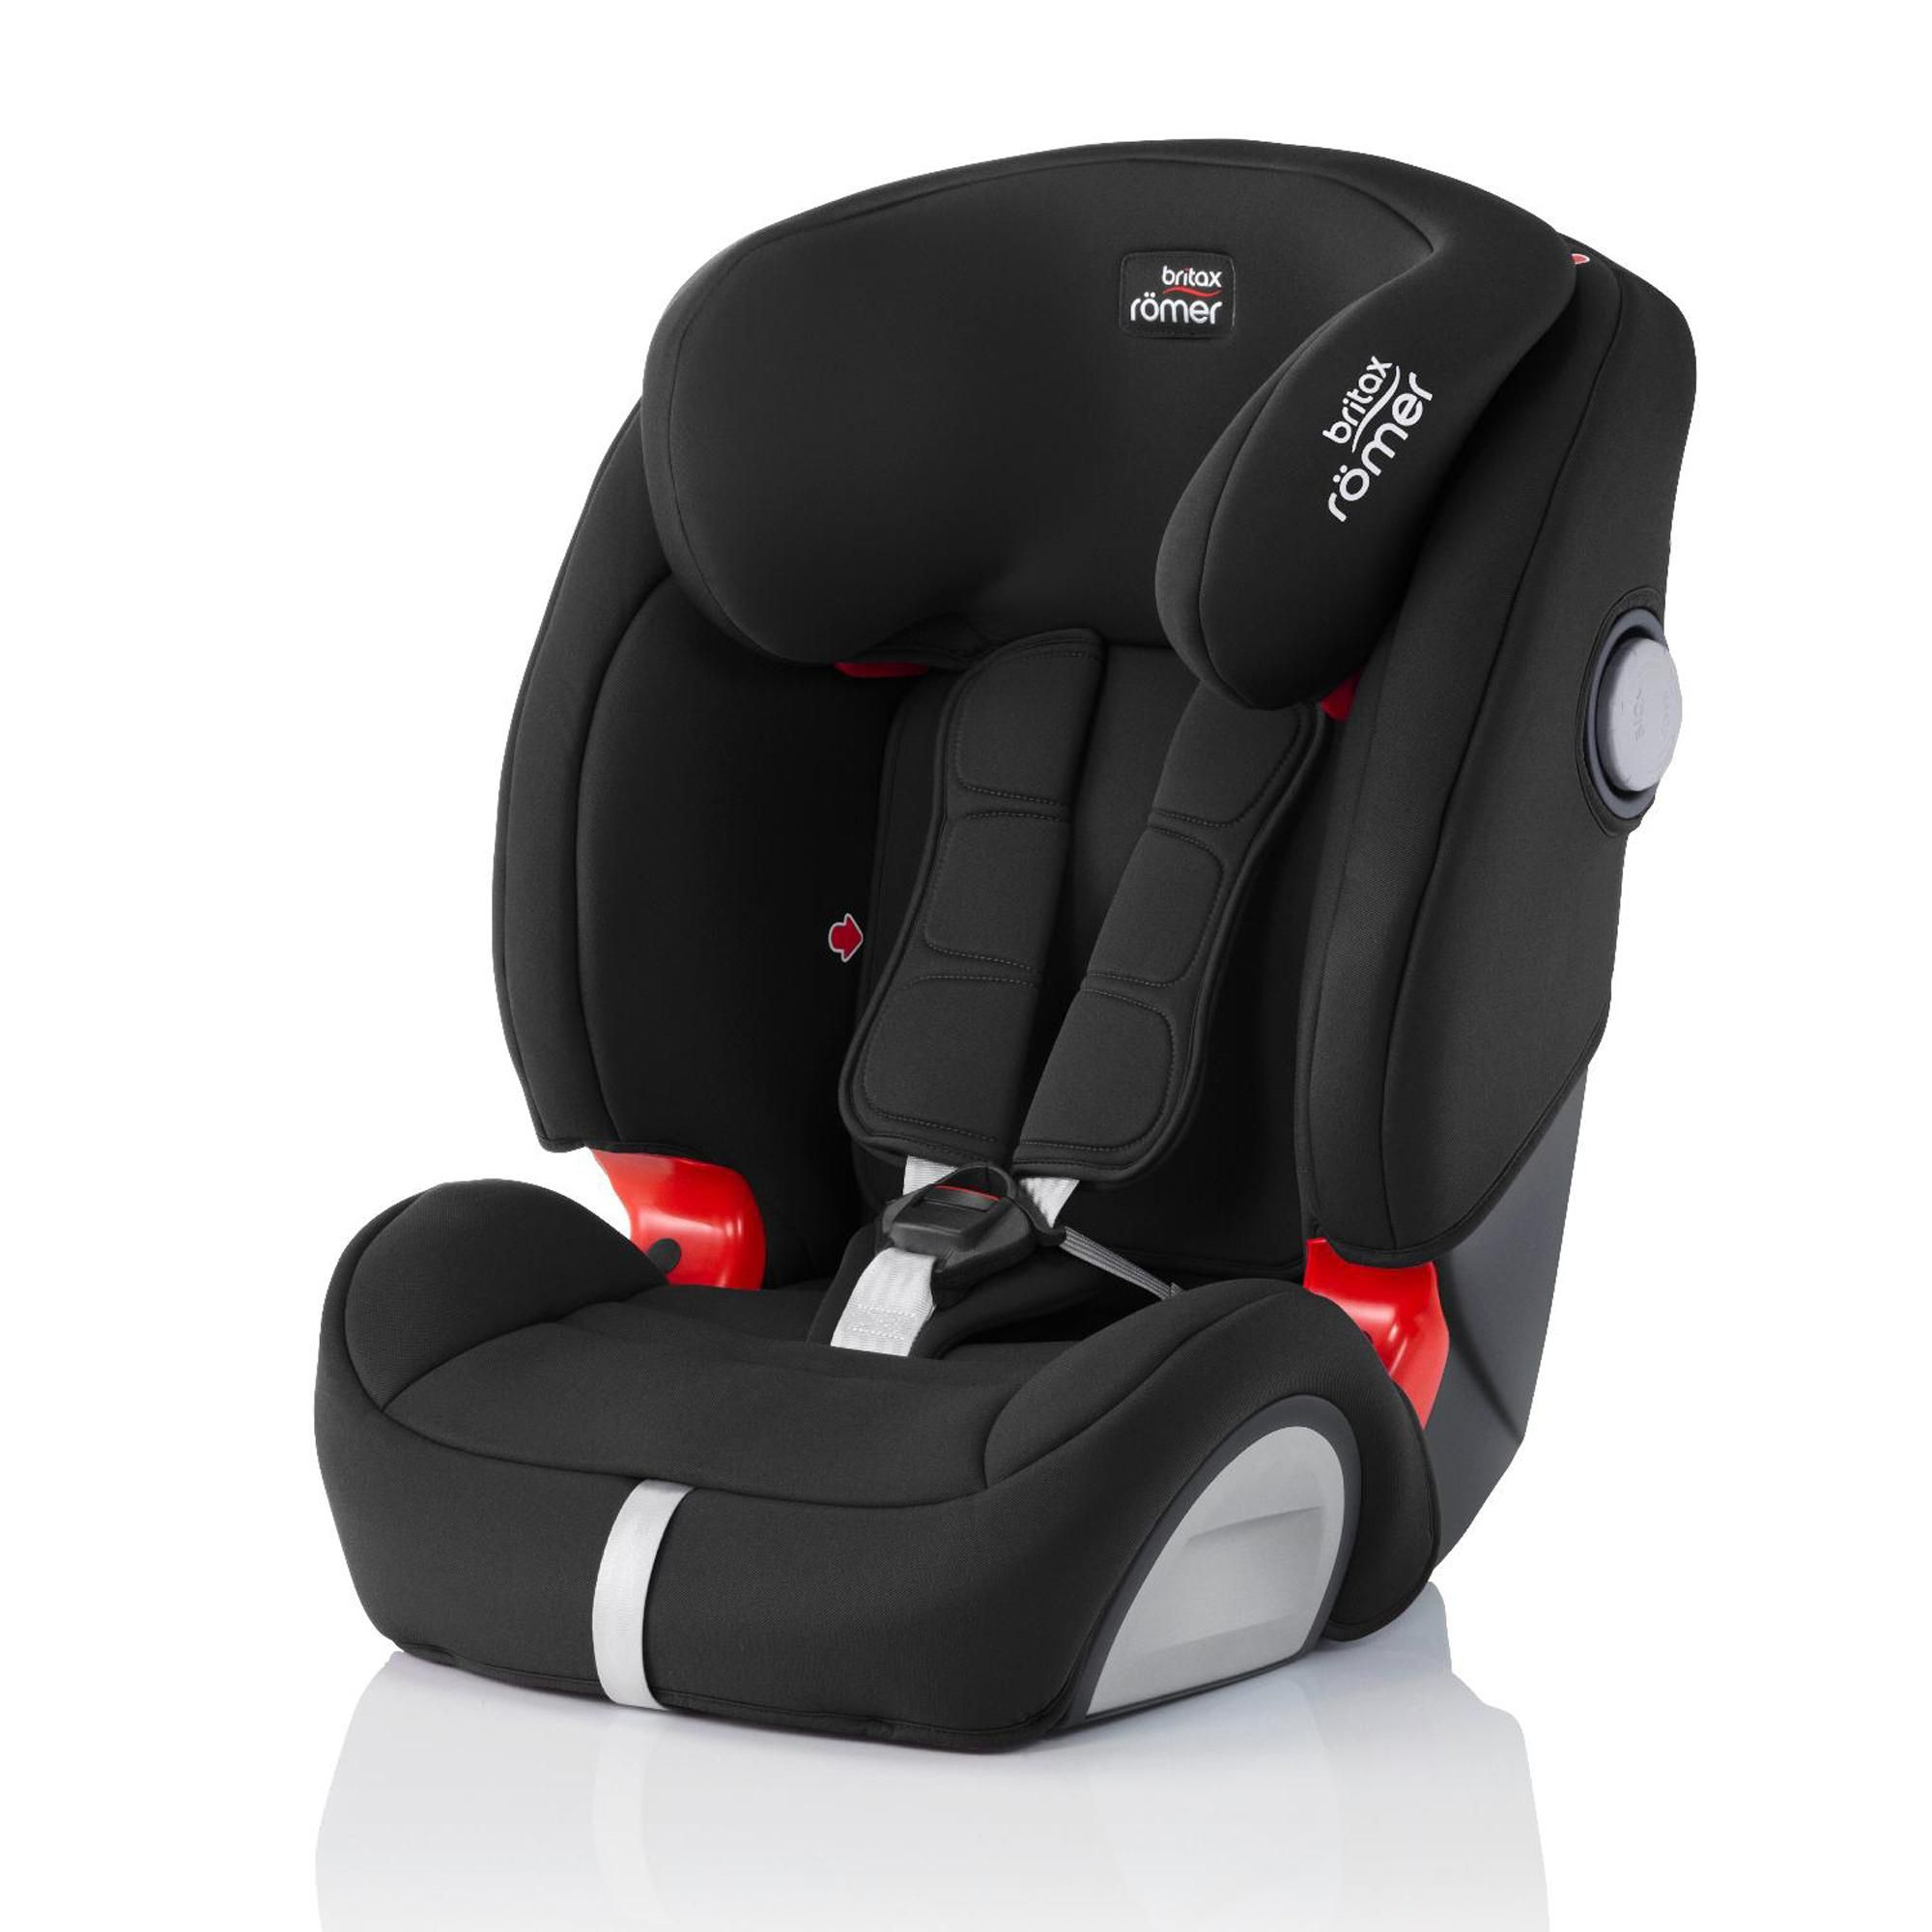 Britax Romer Evolva Sl Sict Group 1 2 3 Cosmos Black Car Seat In 2020 Car Seats Britax Romer Baby Car Seats